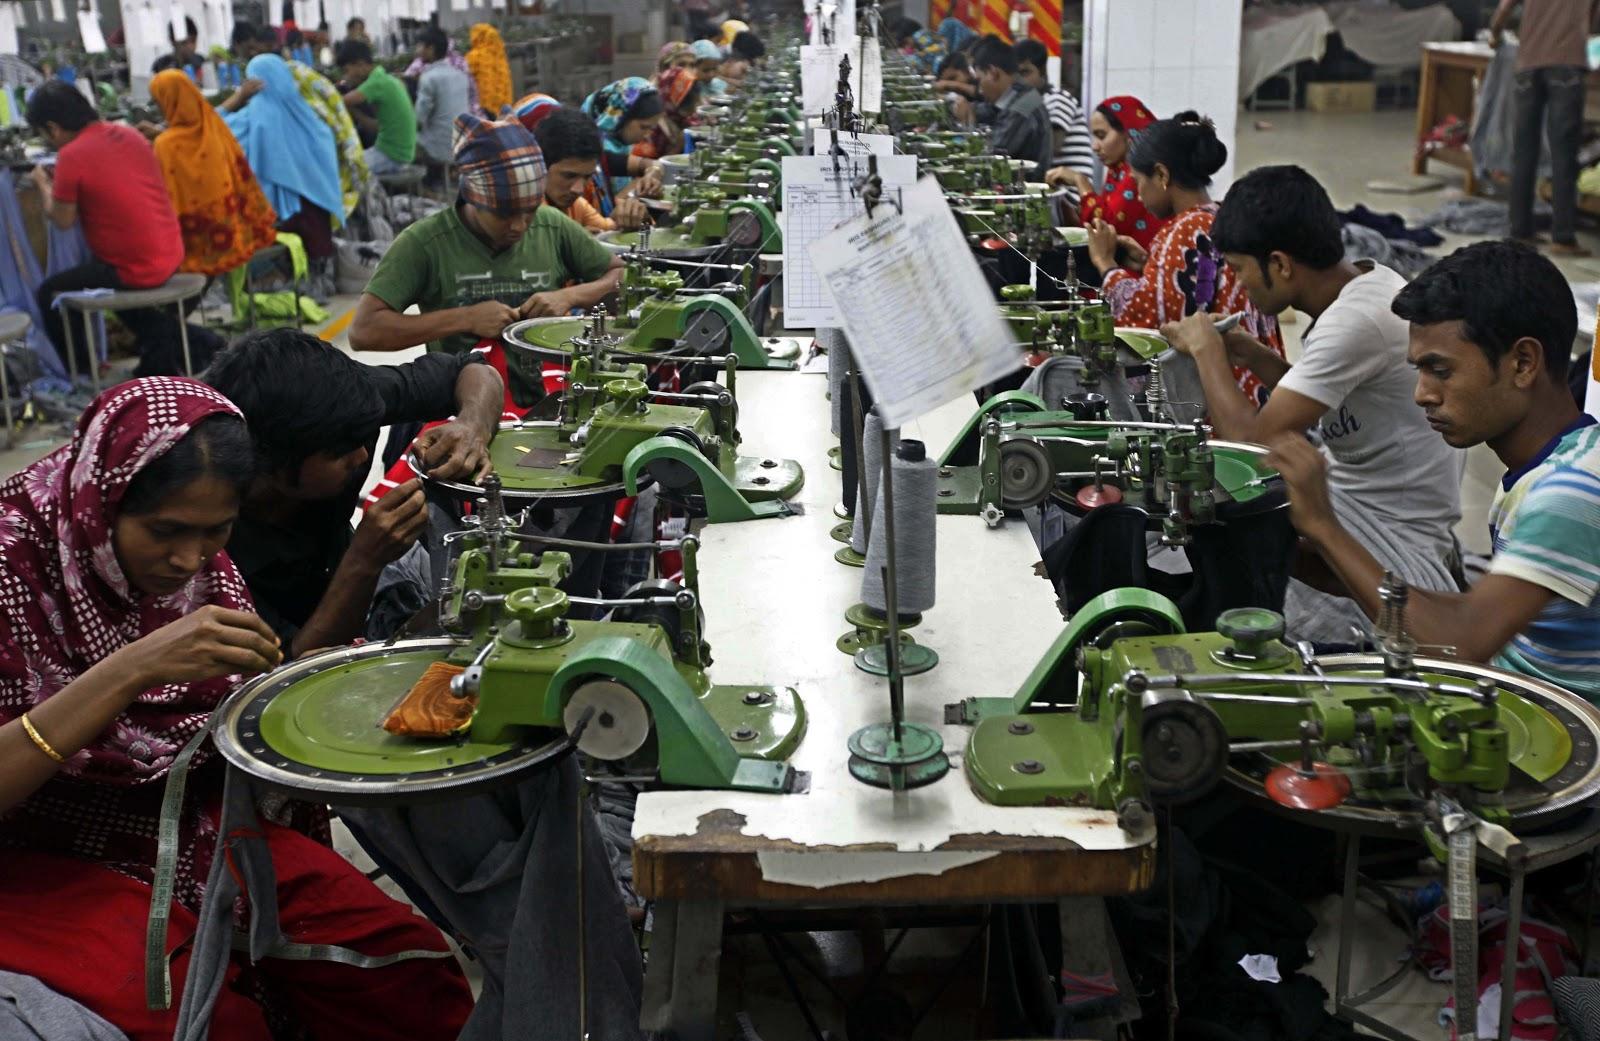 Sweatshops and Disney